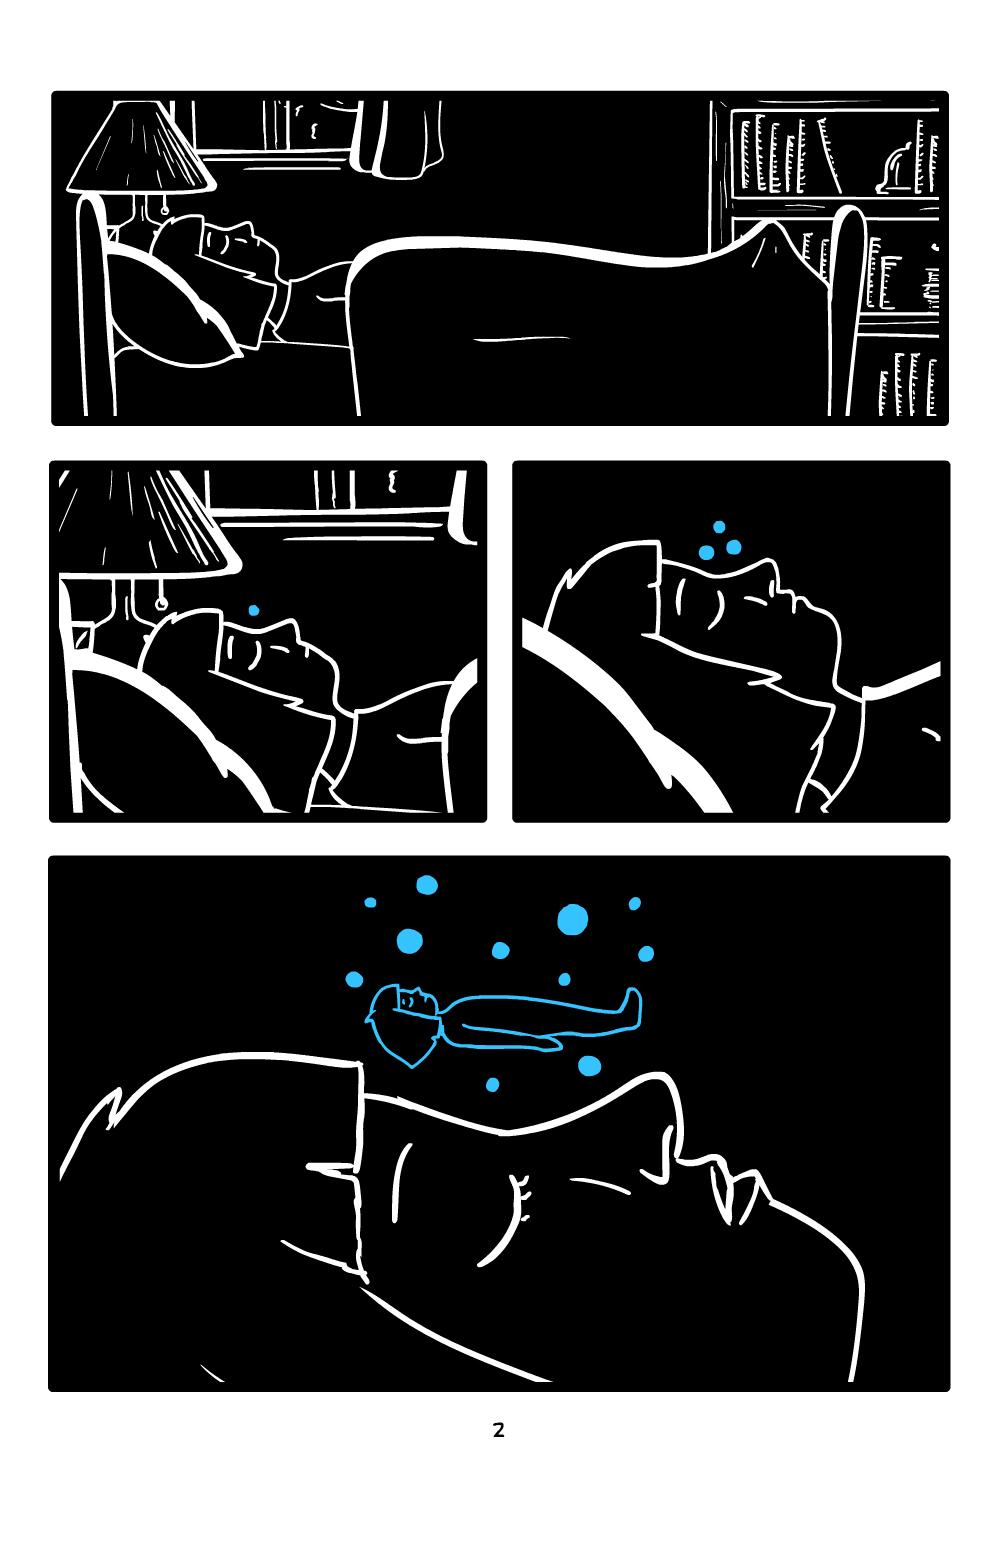 The-Body-Sleeps-9-15-02.jpg